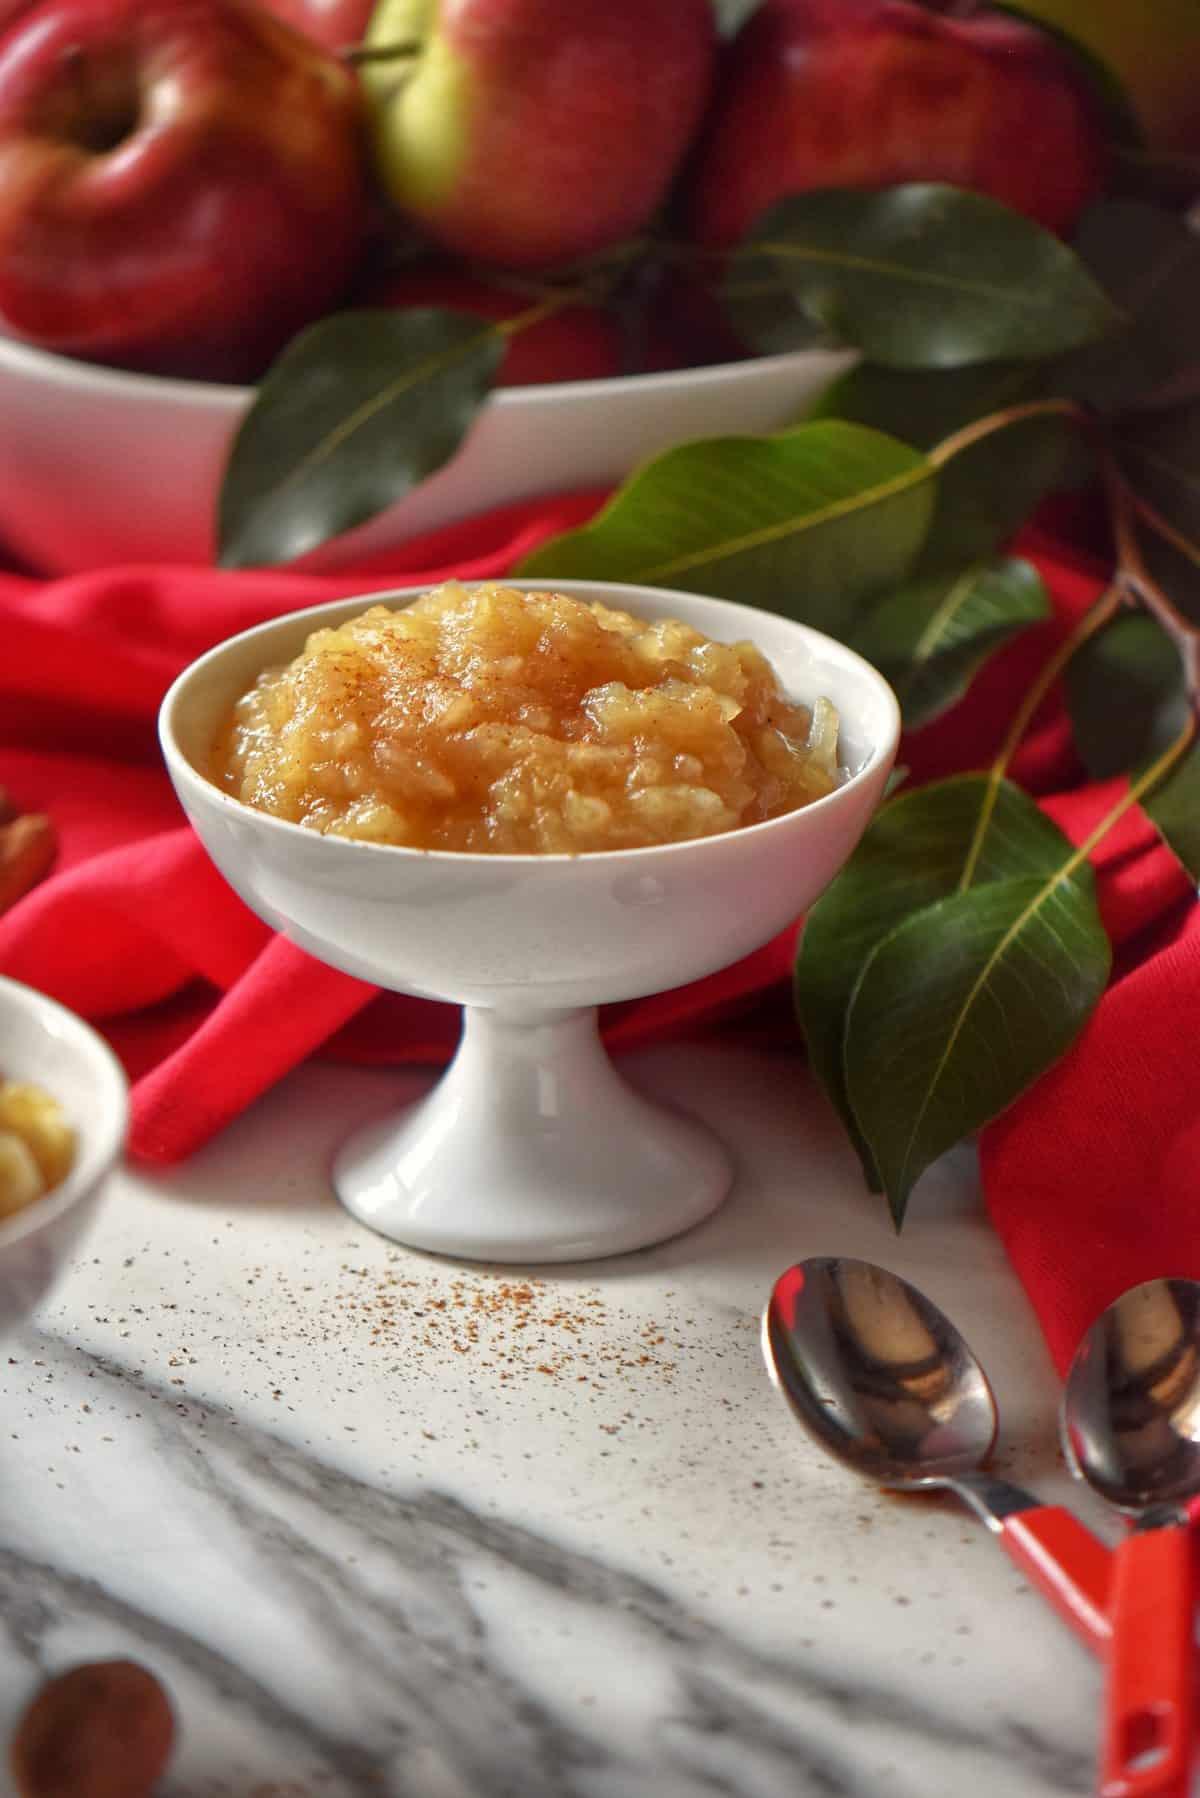 A generous bowl of sugar free applesauce in a white ceramic dish.